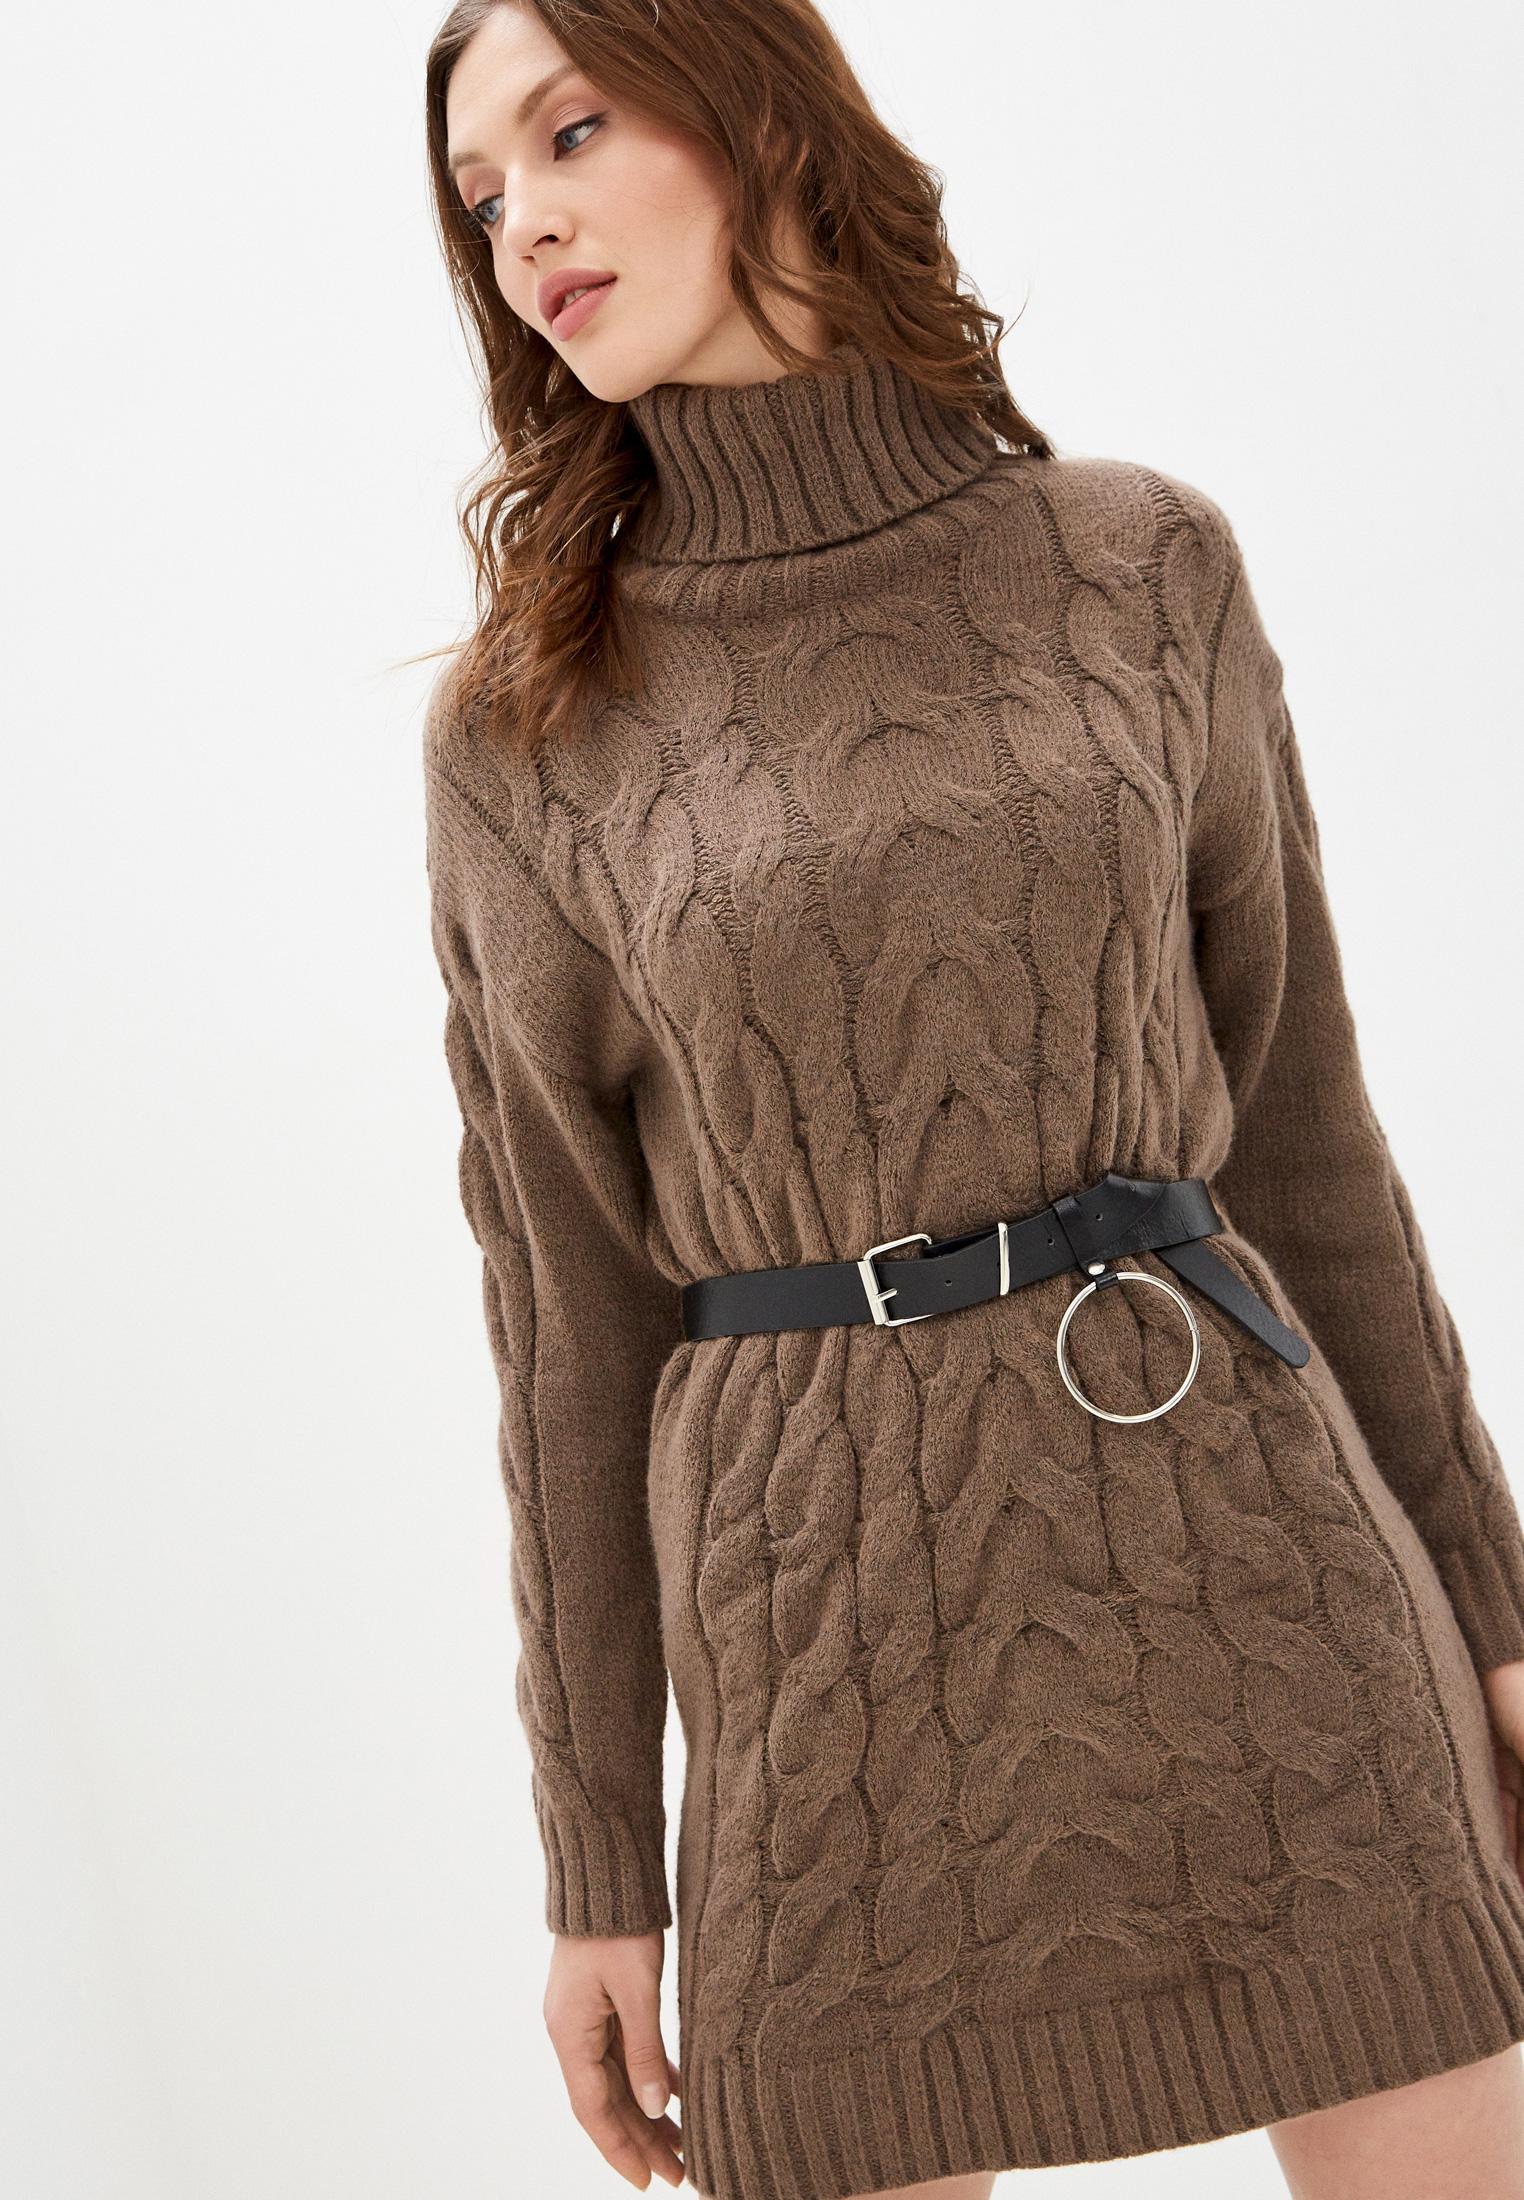 Вязаное платье Vickwool WV271-1